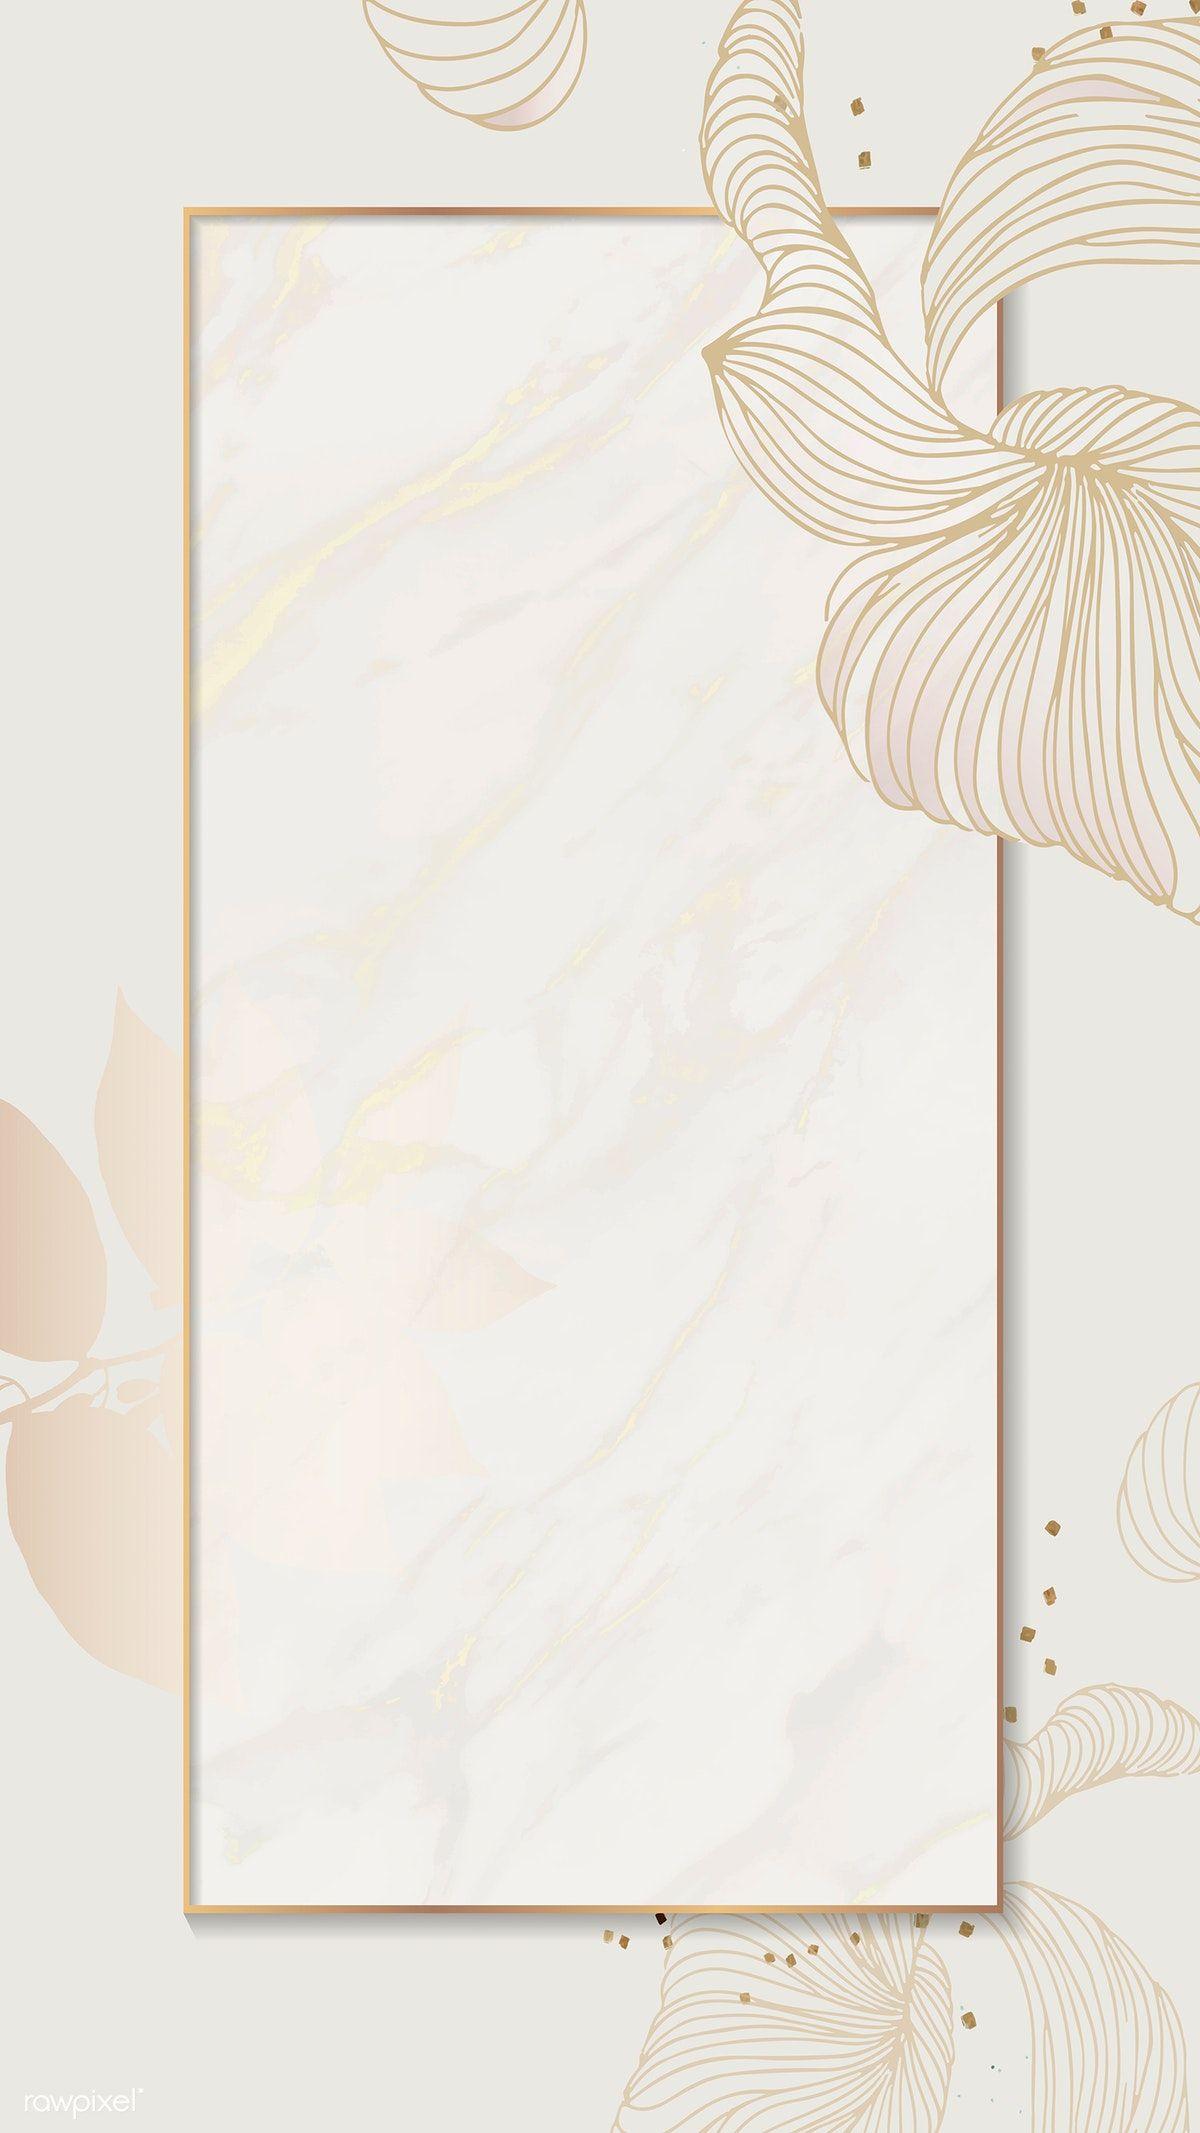 Download Premium Vector Of Golden Floral Rectangle Frame Mobile